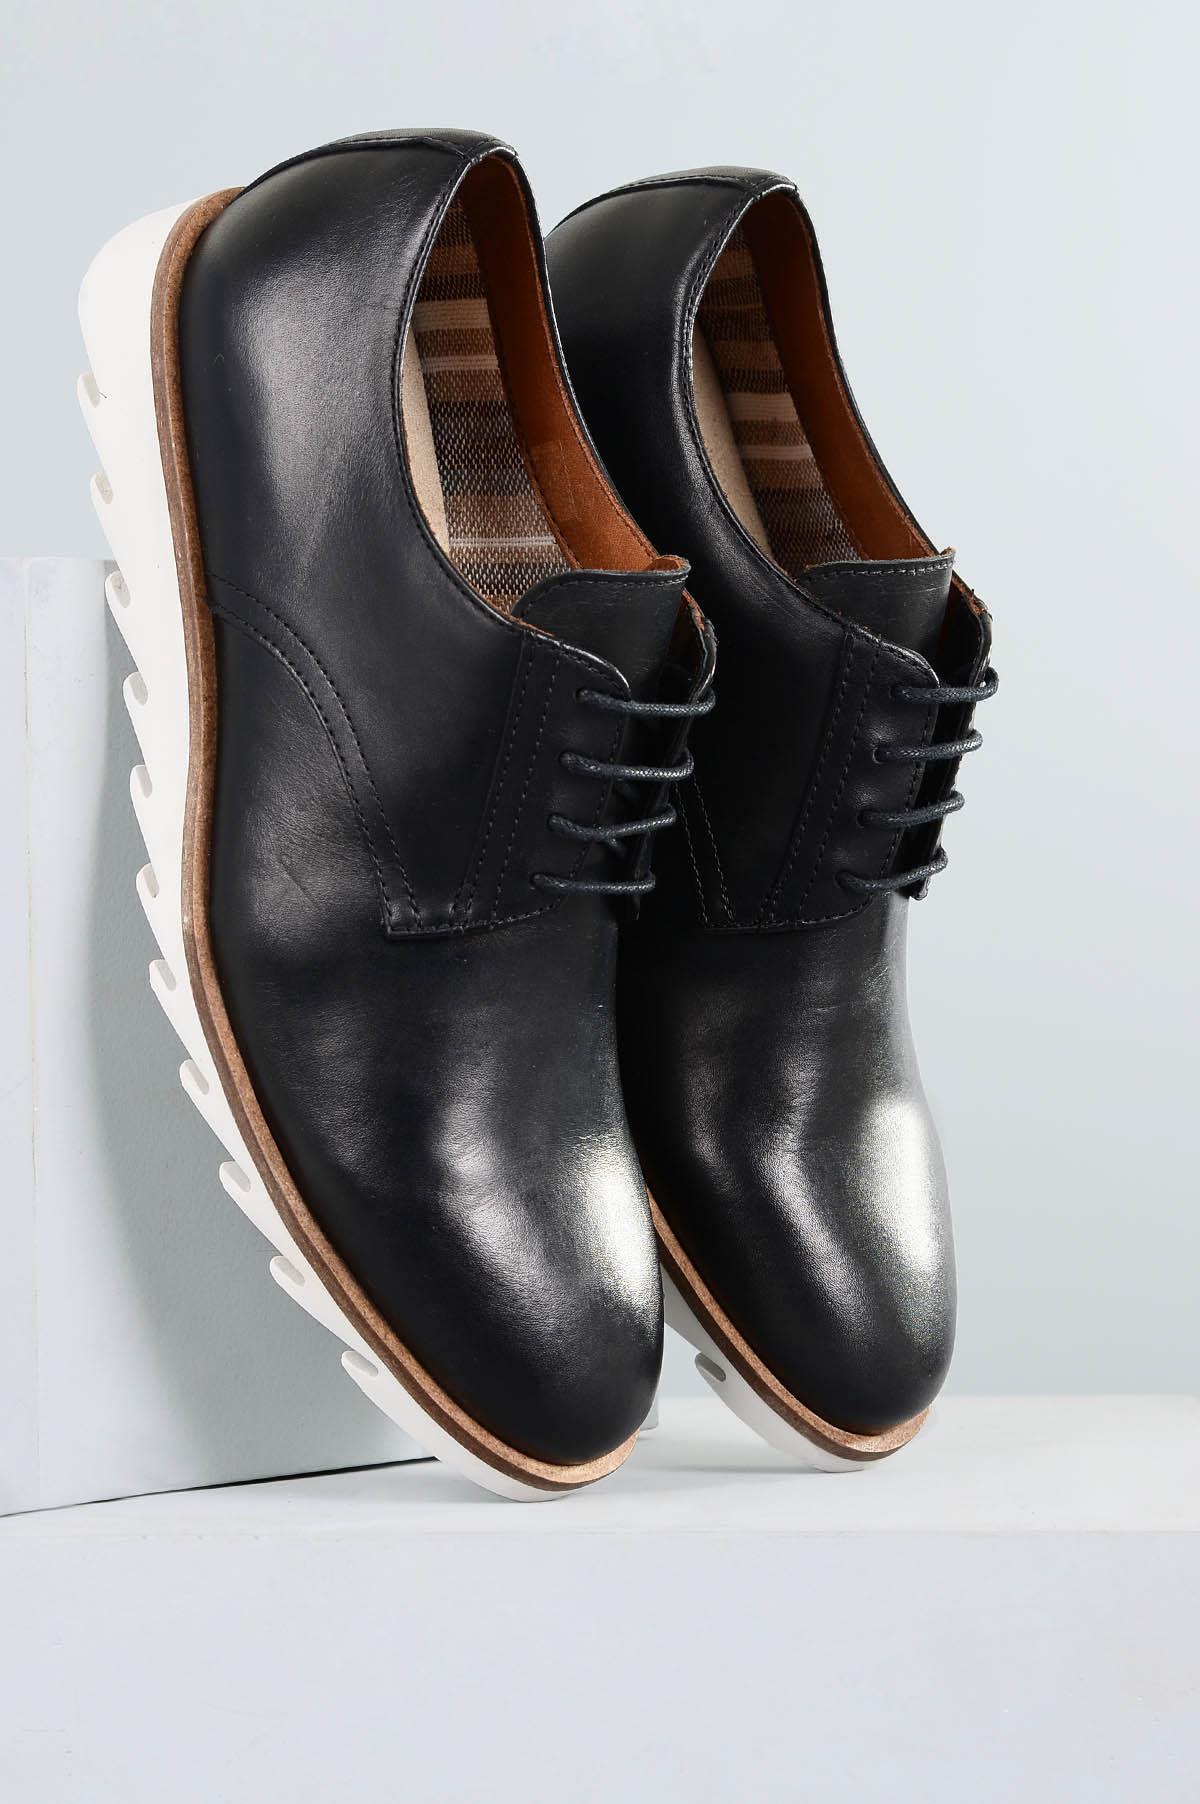 82676fb941 Sapato Masculino Moisés Mundial CR-PRETO - Mundial Calçados